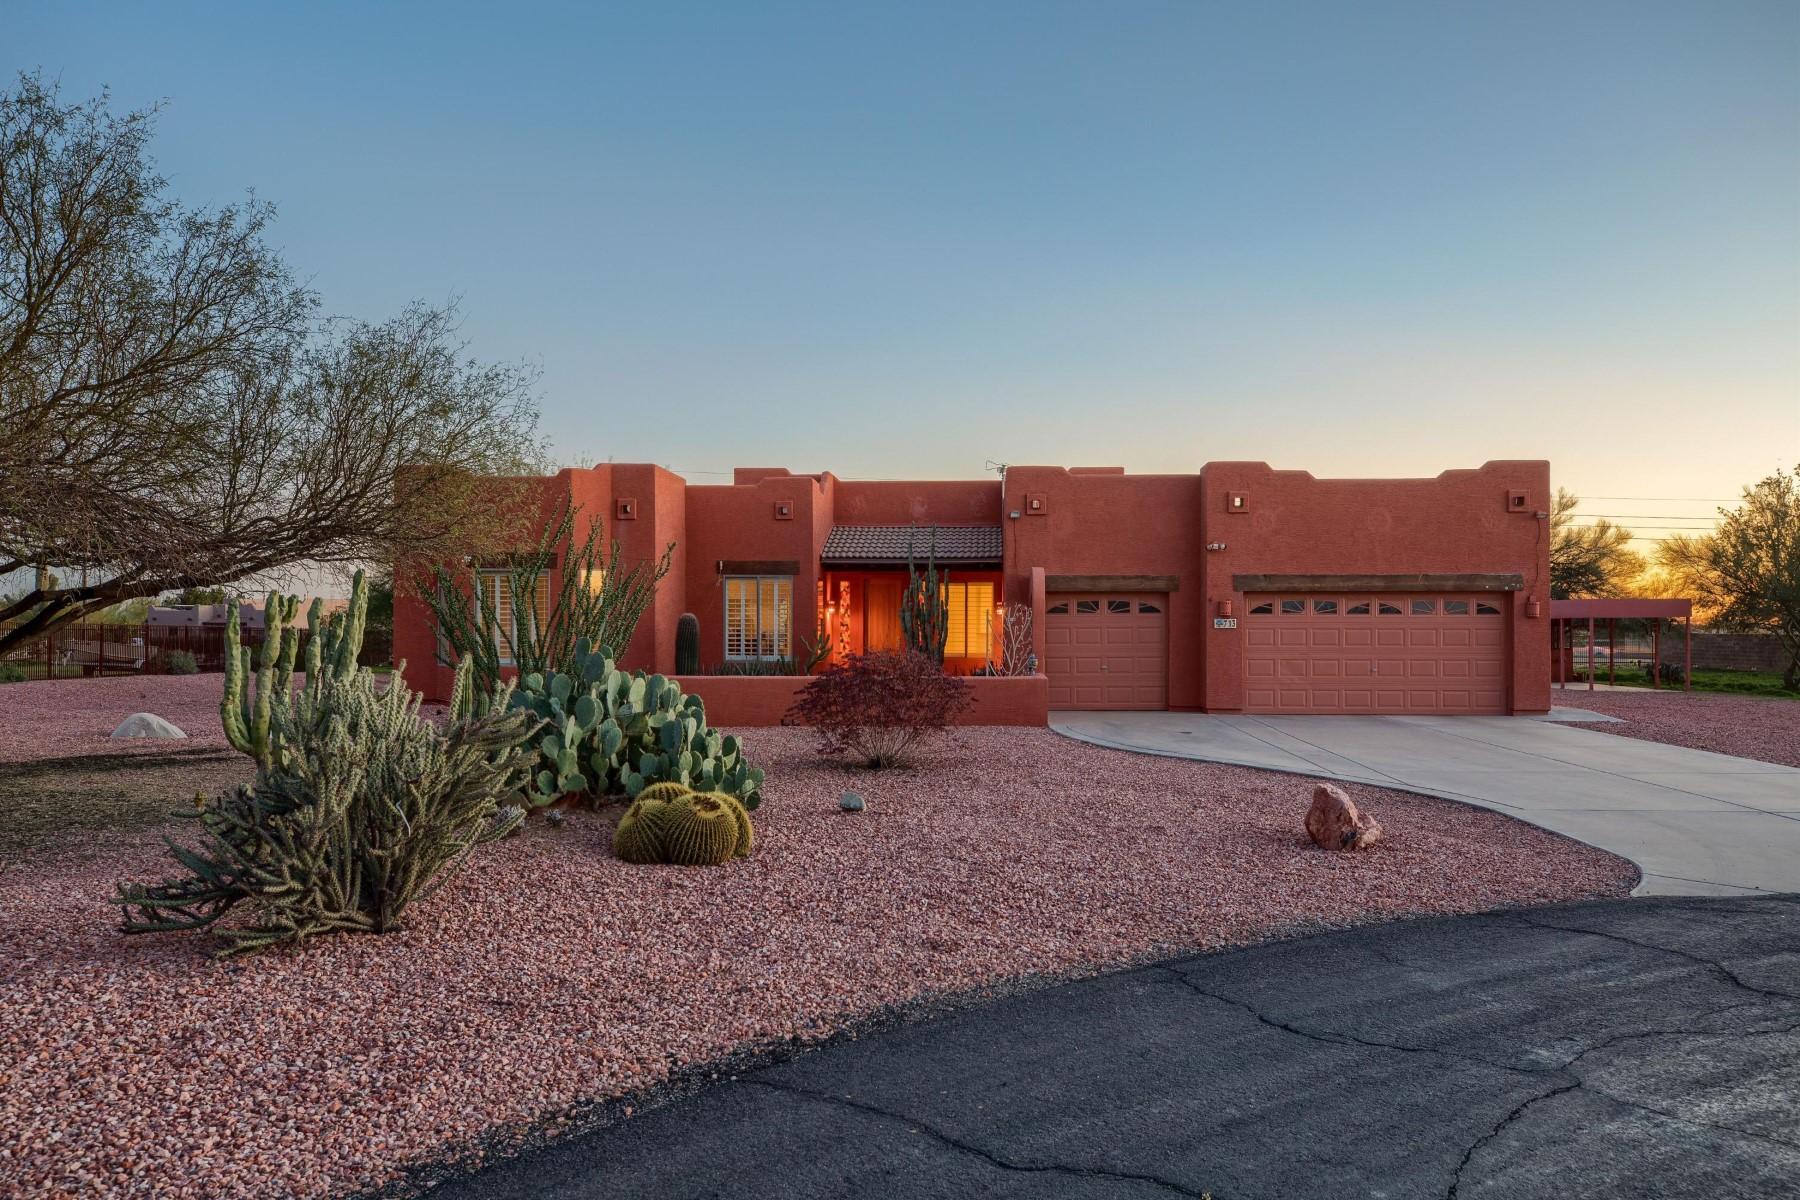 独户住宅 为 销售 在 Lovely corner lot home in Desert Hills 713 E Desert Ranch Rd 菲尼克斯(凤凰城), 亚利桑那州, 85086 美国